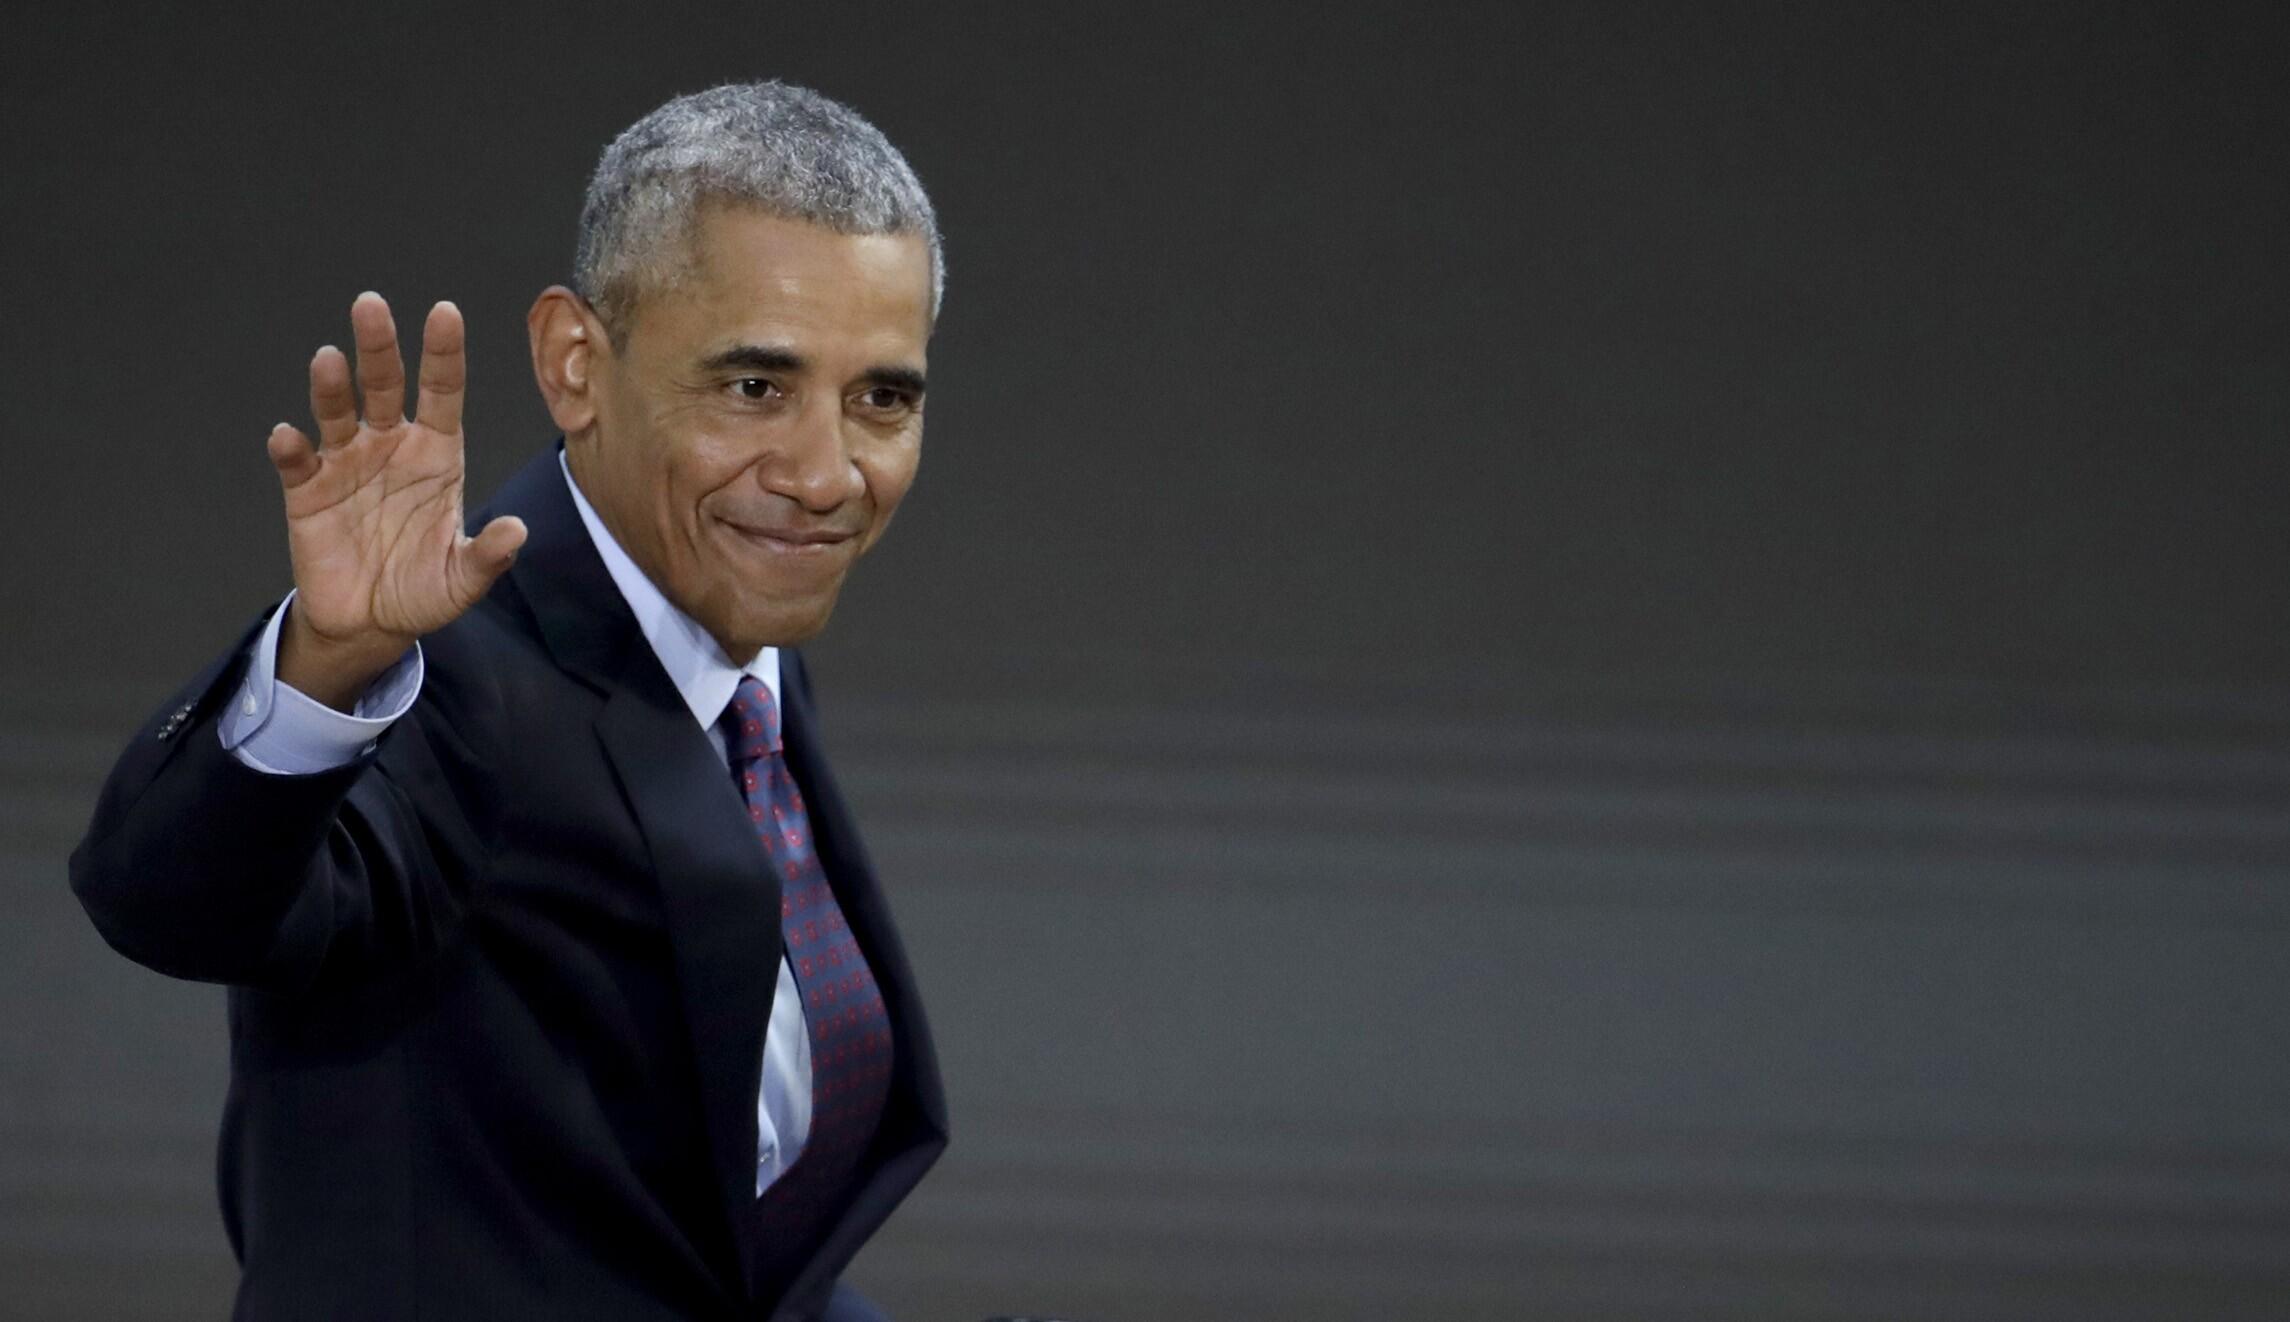 Trump White House has a new \'bump stock\' strategy: Blame Obama